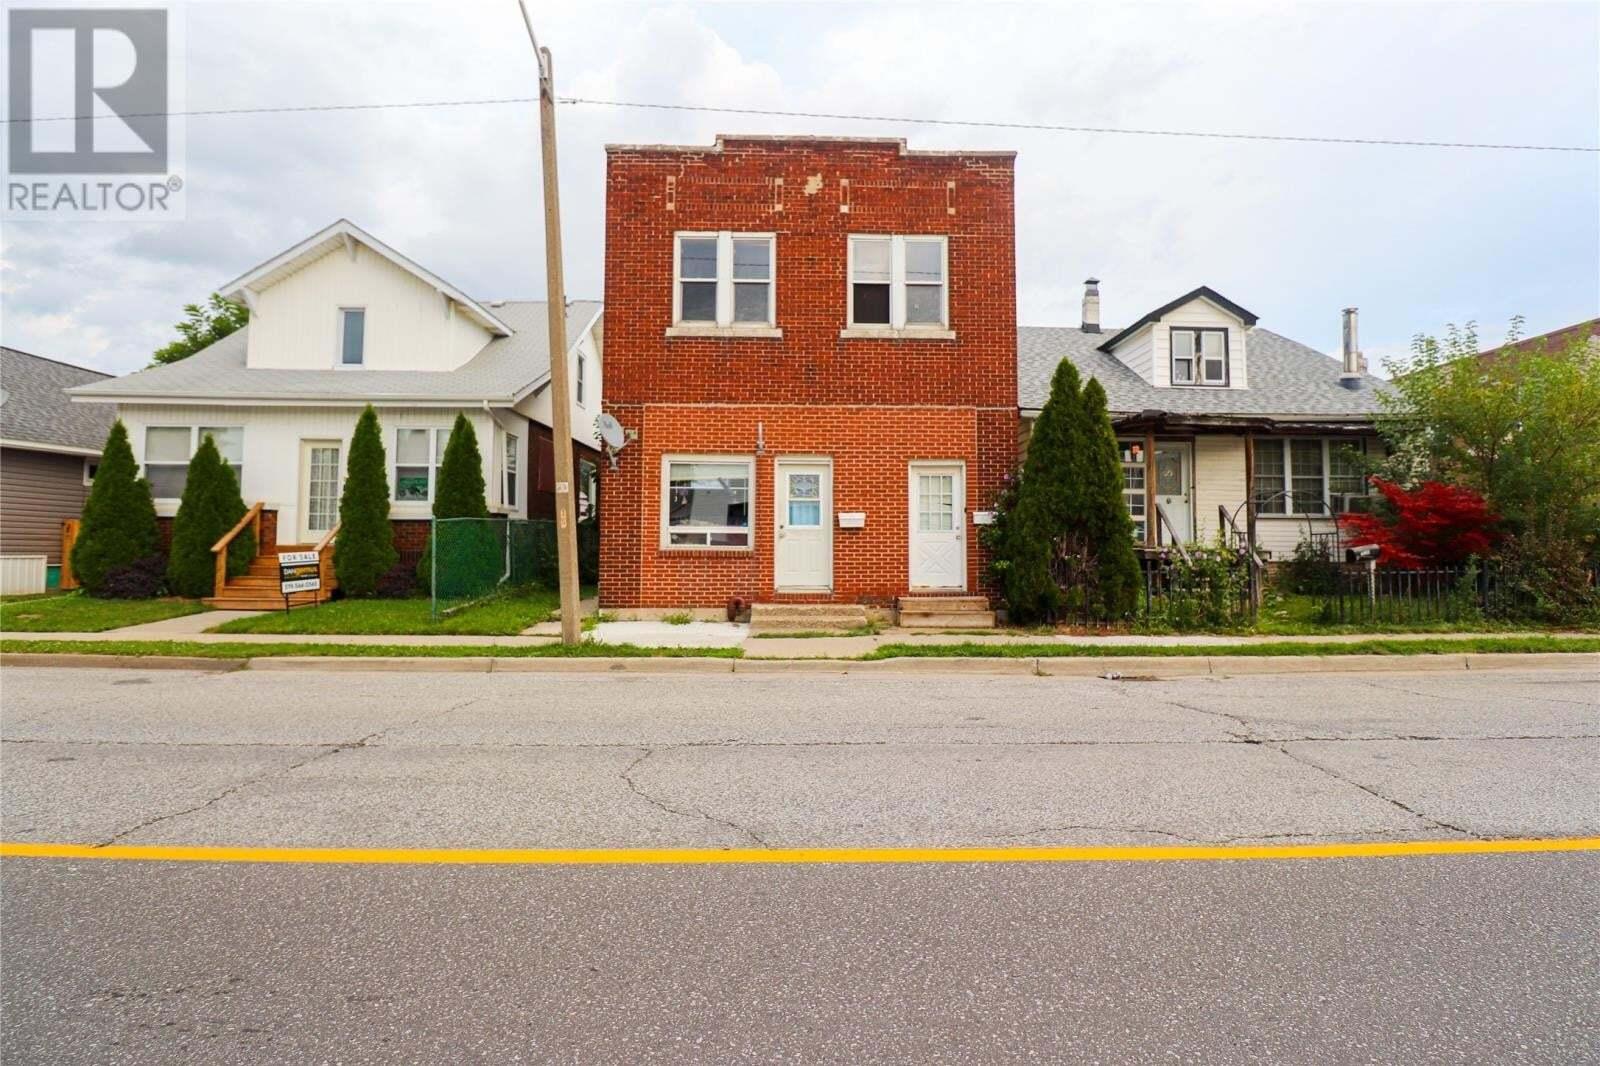 Townhouse for sale at 1622 Drouillard  Windsor Ontario - MLS: 20009715